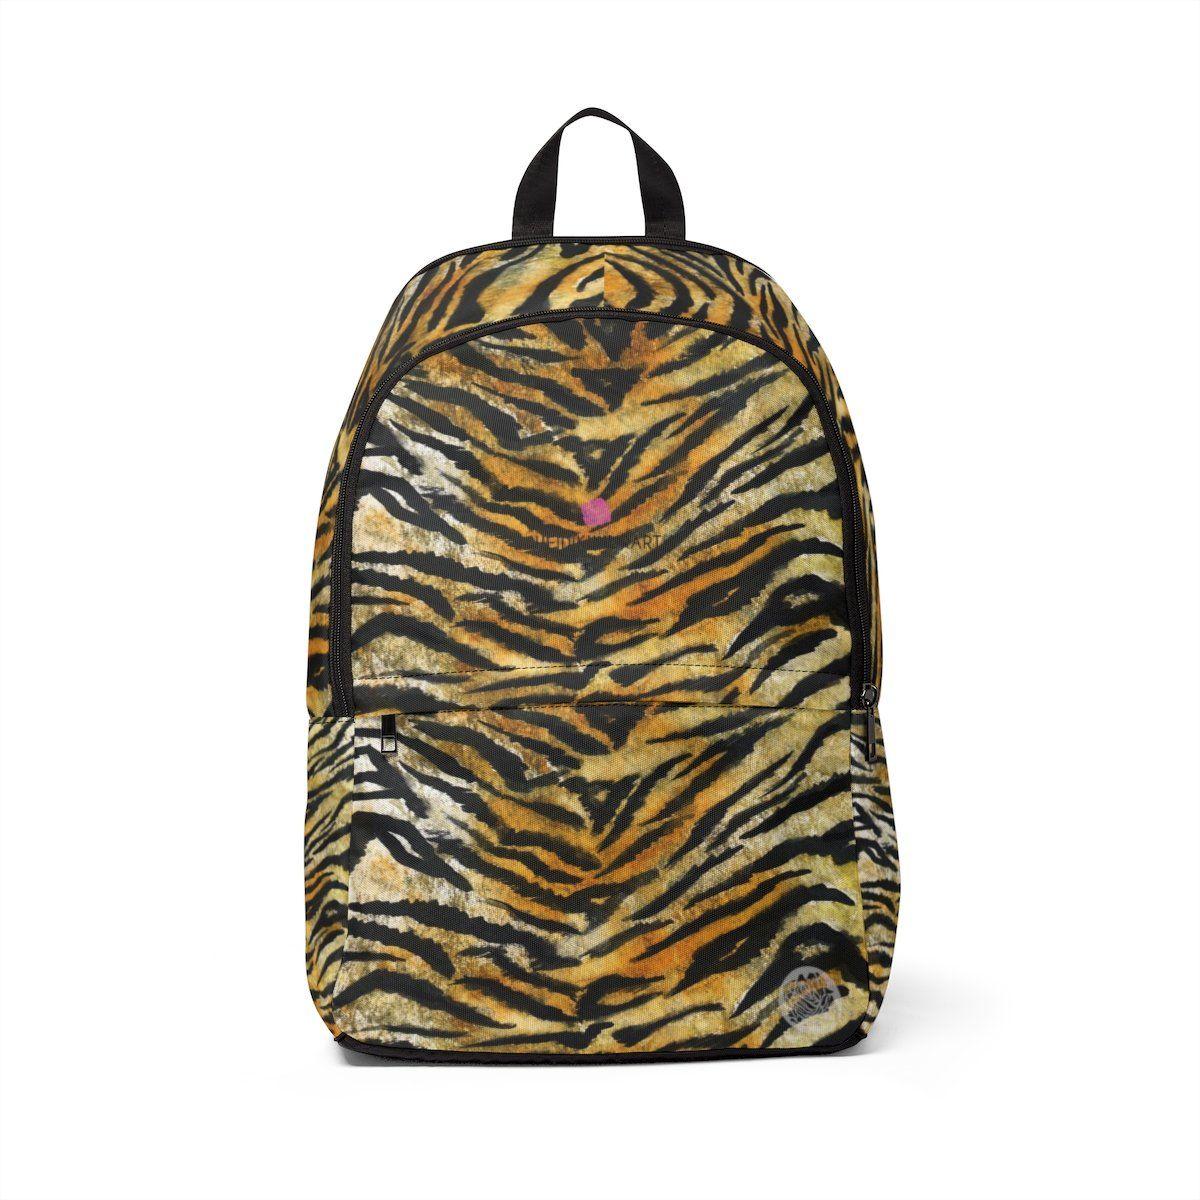 cad011a6b46 Yoru Tiger Animal Skin Unisex Large Size Waterproof Fabric Designer Backpack    Cool Back to School Backpacks School Bags Ideas   Pinterest   Backpacks,  ...